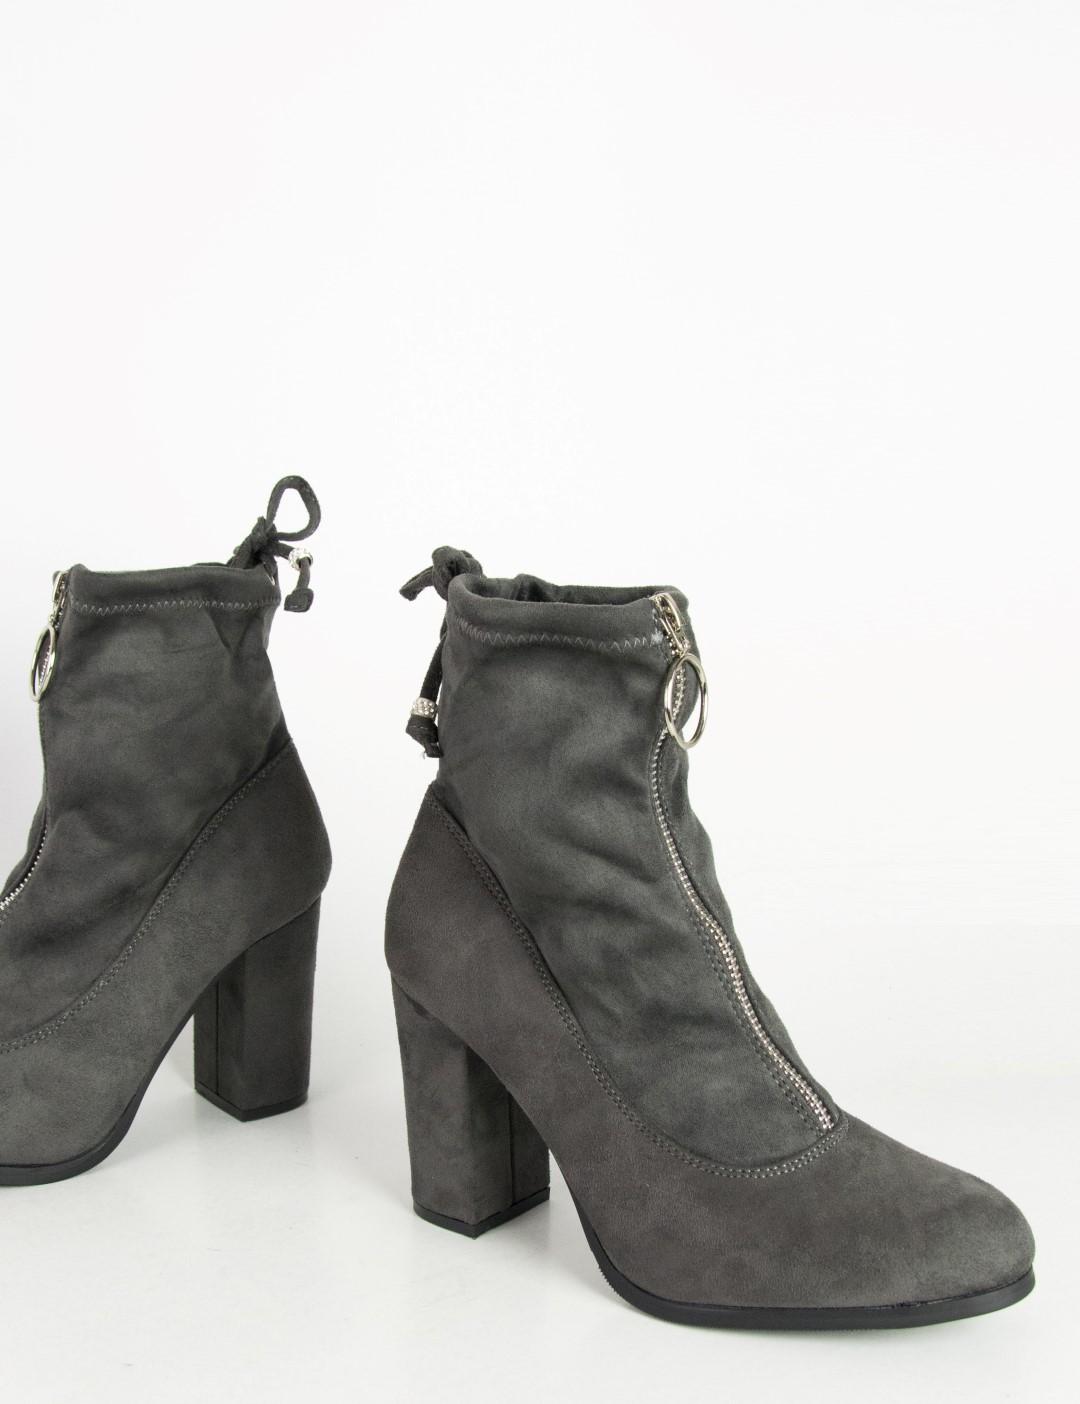 3ac981a0c87 Γυναικεία Παπούτσια, Γυναικεία Μποτάκια, Ψηλοτάκουνα Μποτάκια